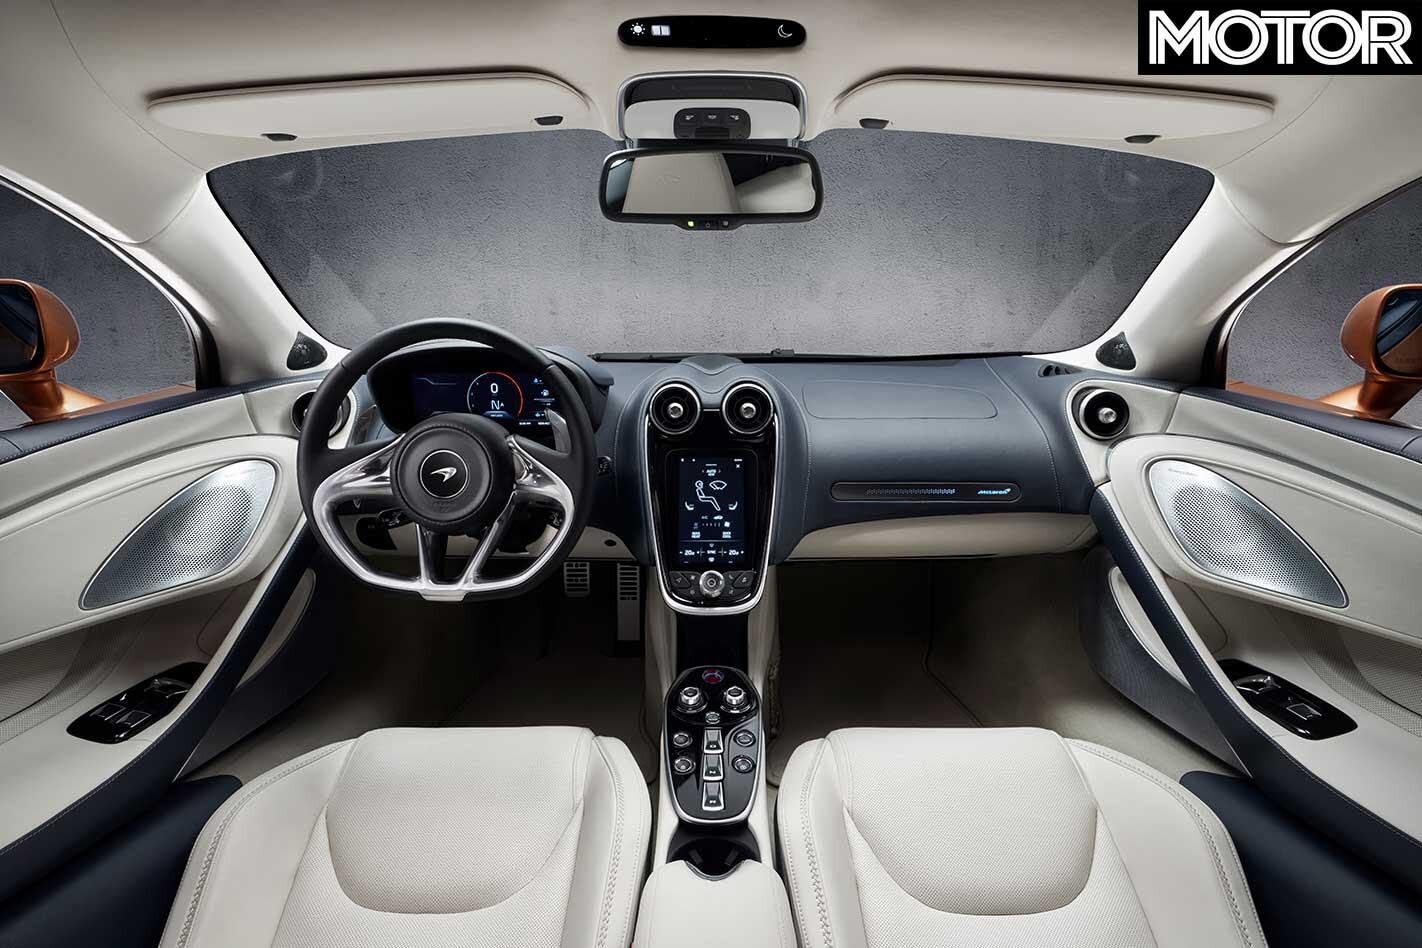 2020 Mc Laren GT Interior 281 29 Jpg